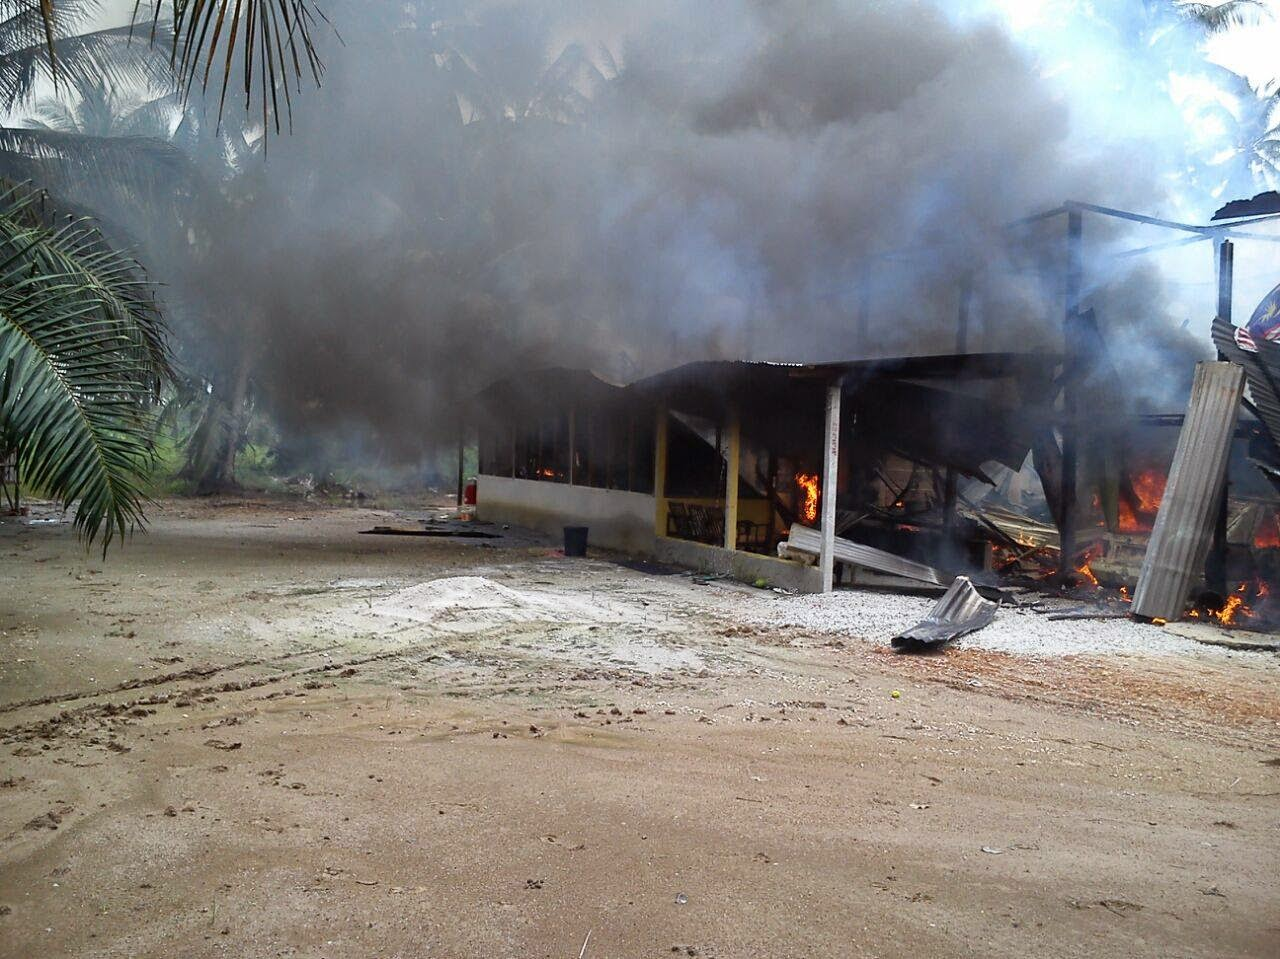 Kebakaran Di Parit 7 Hutan Melintang Bagan Datoh